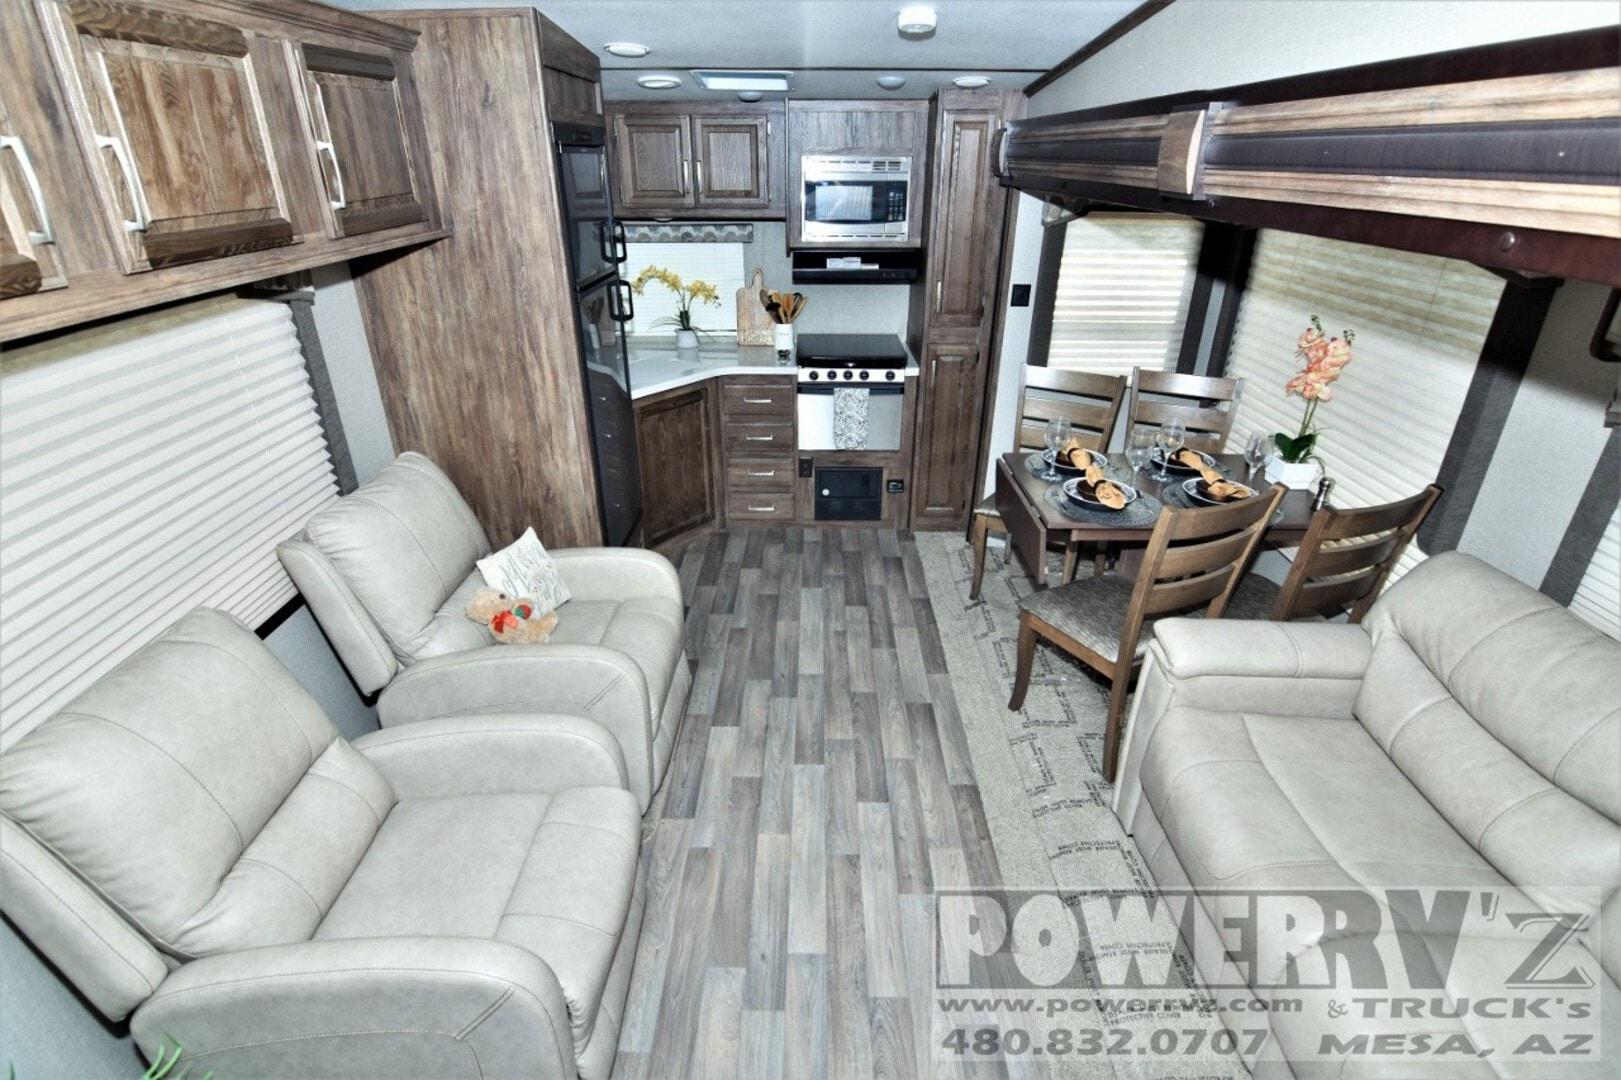 Used, 2018, Keystone, Cougar X-Lite 27RKS, Fifth Wheels